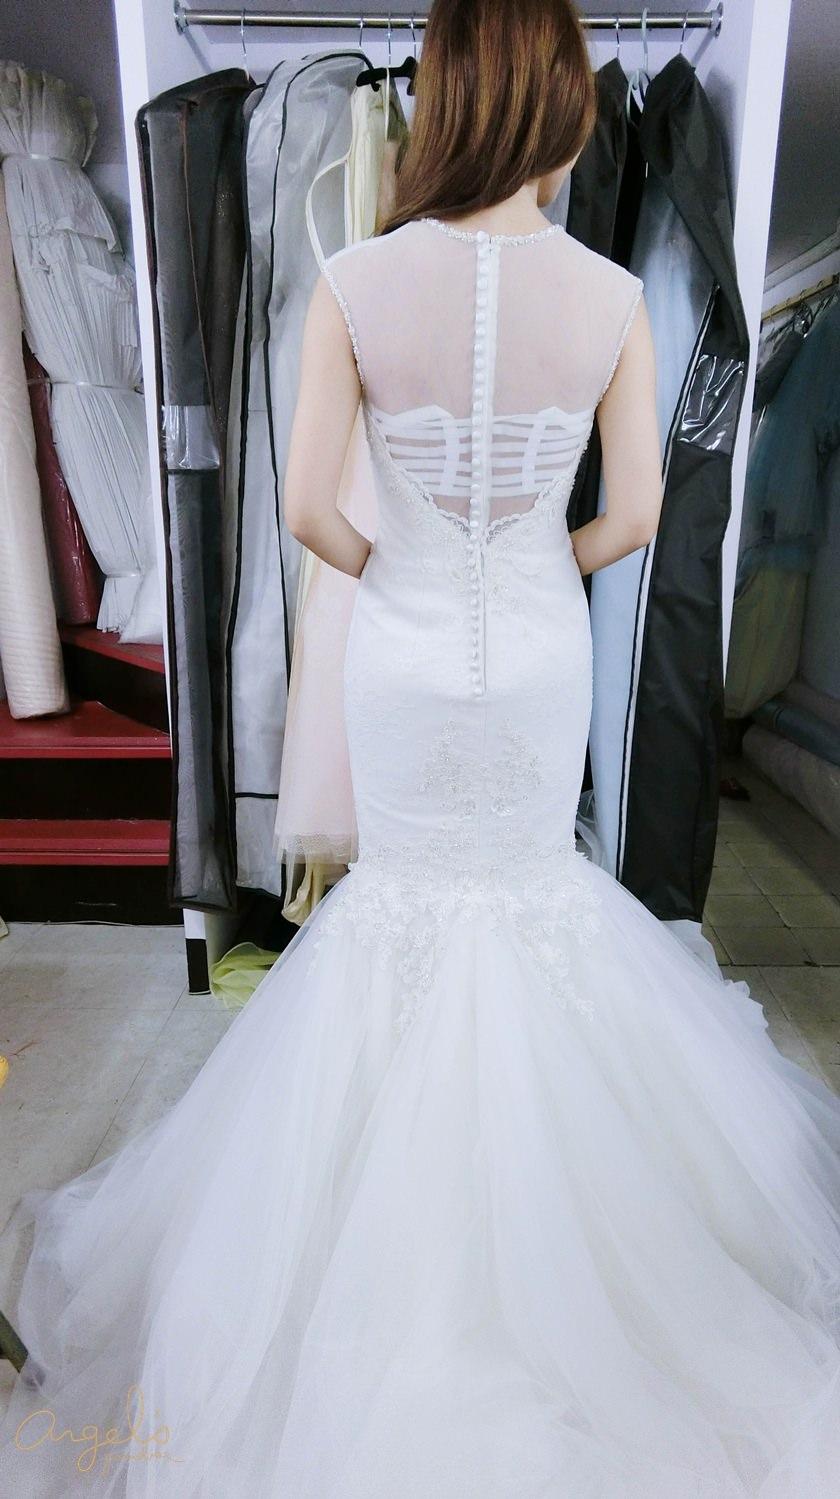 weddingdressCIMG0135